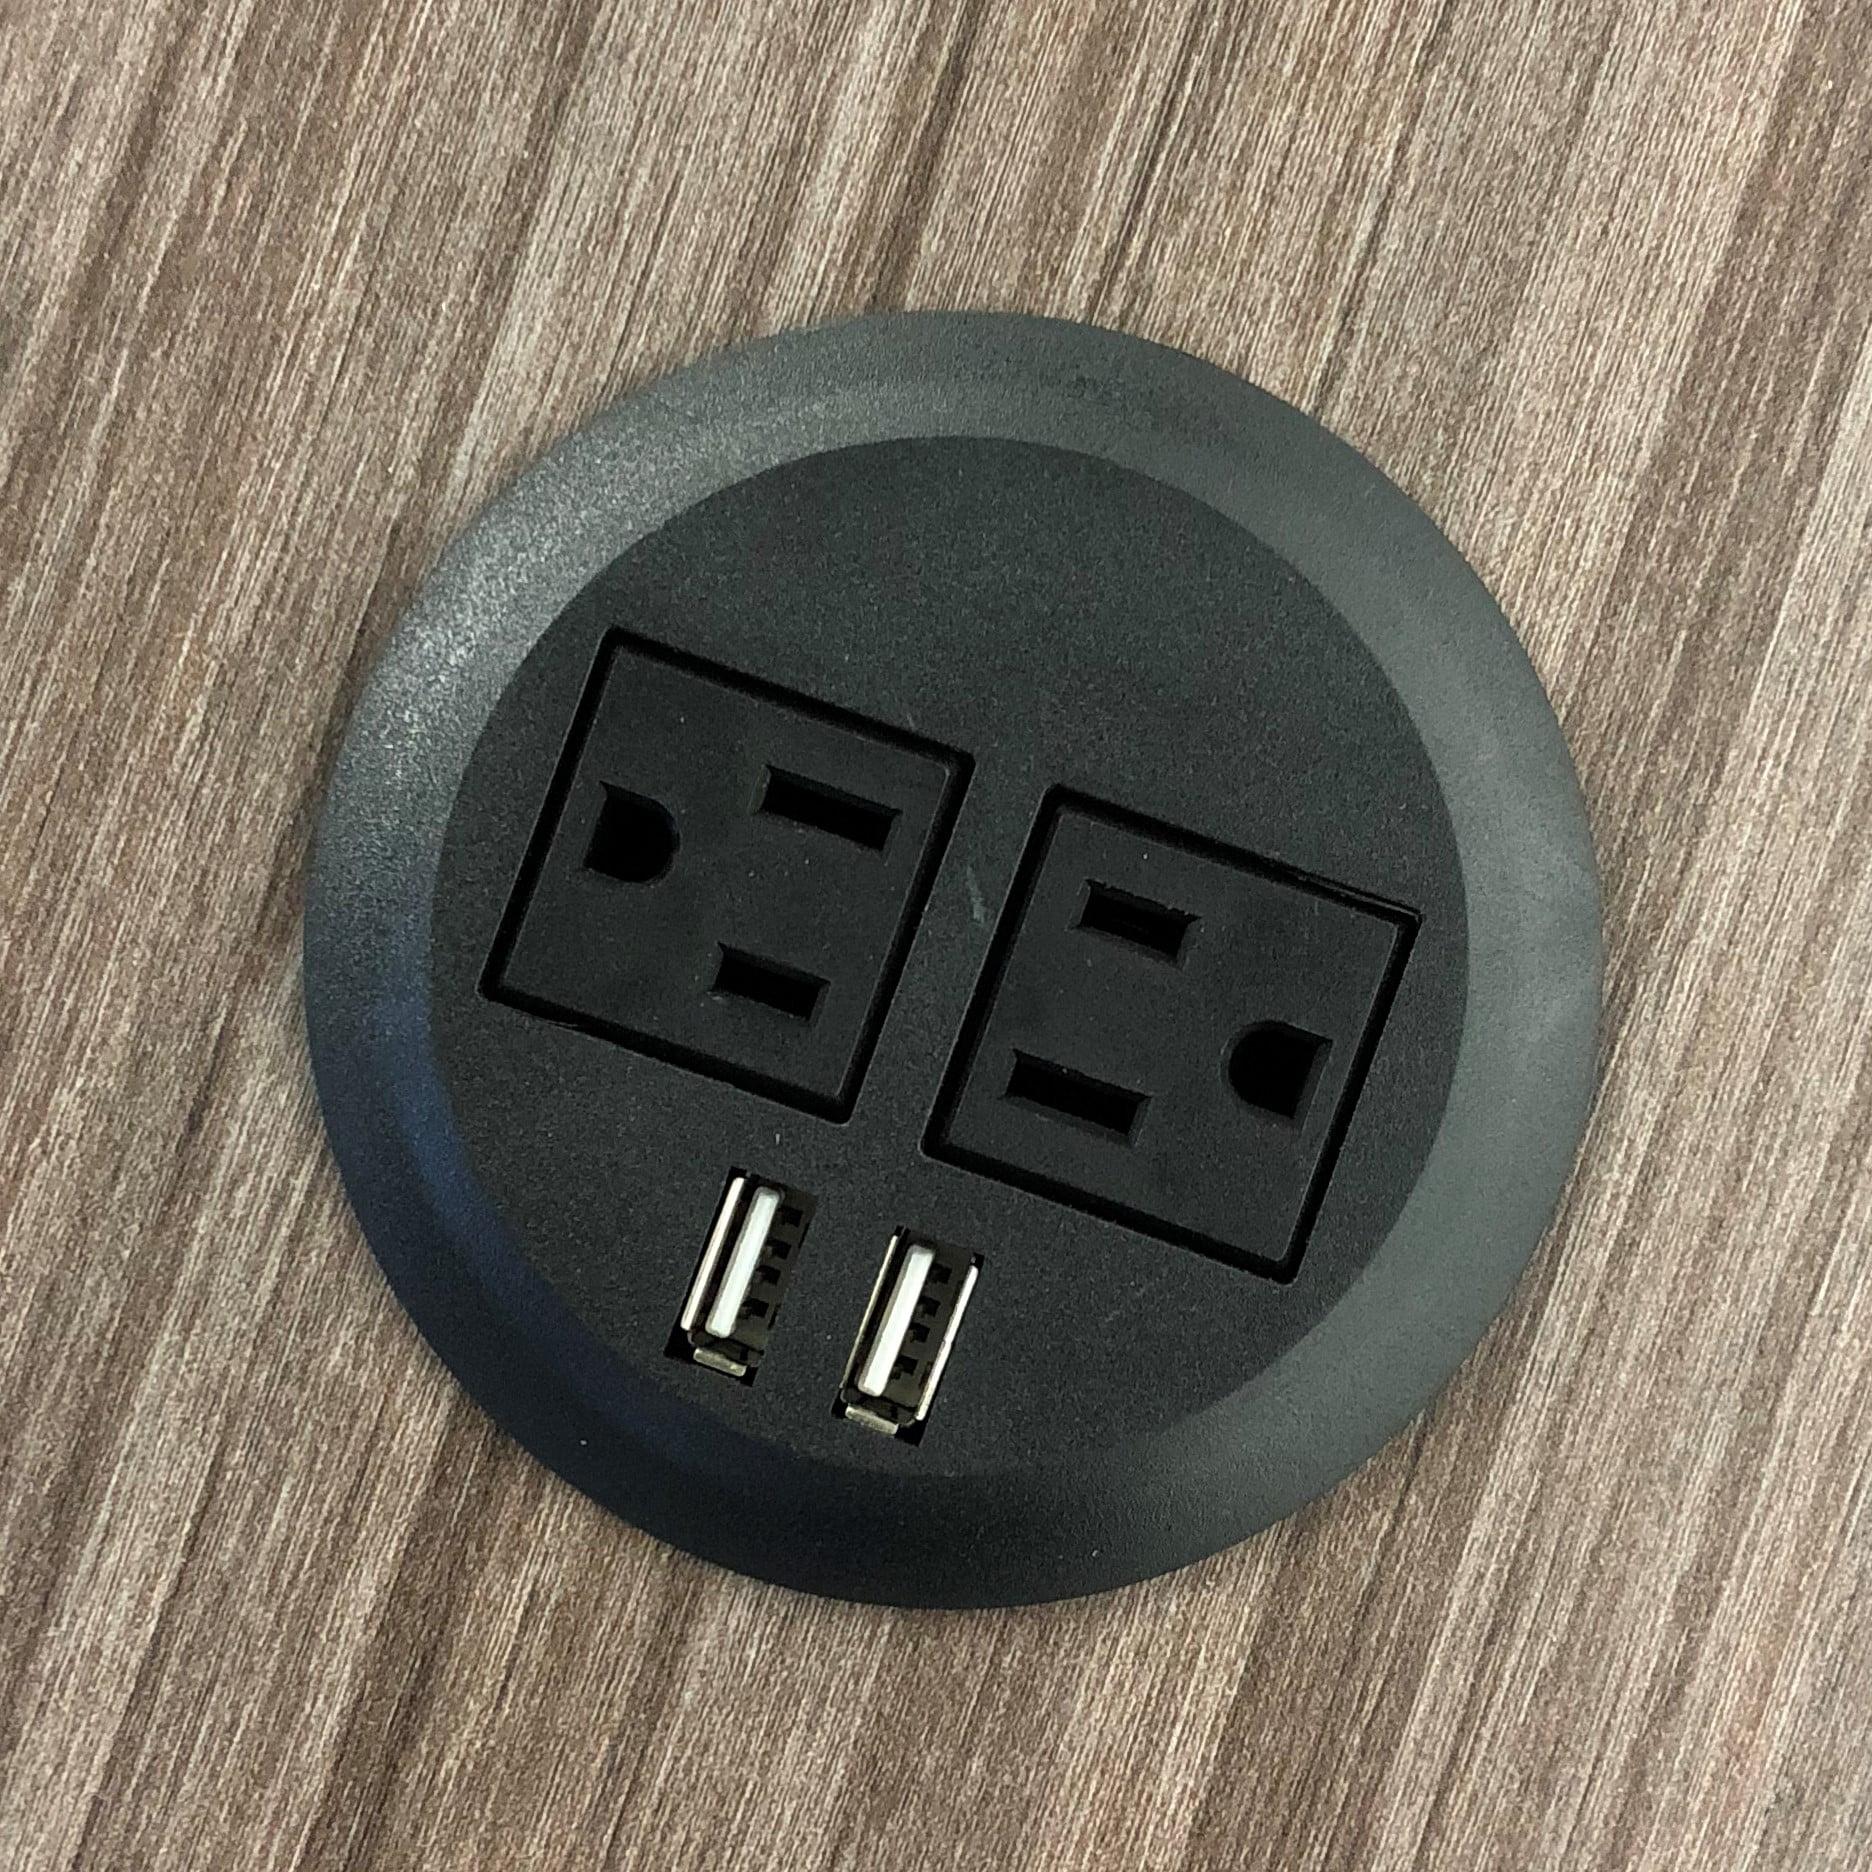 "PWR-Plug Power Grommet for Desk Office Furniture Fits 3"" Inch Standard Grommet Hole 2 AC Outlets 2 USB Charging Ports ETL Listed (Black)"